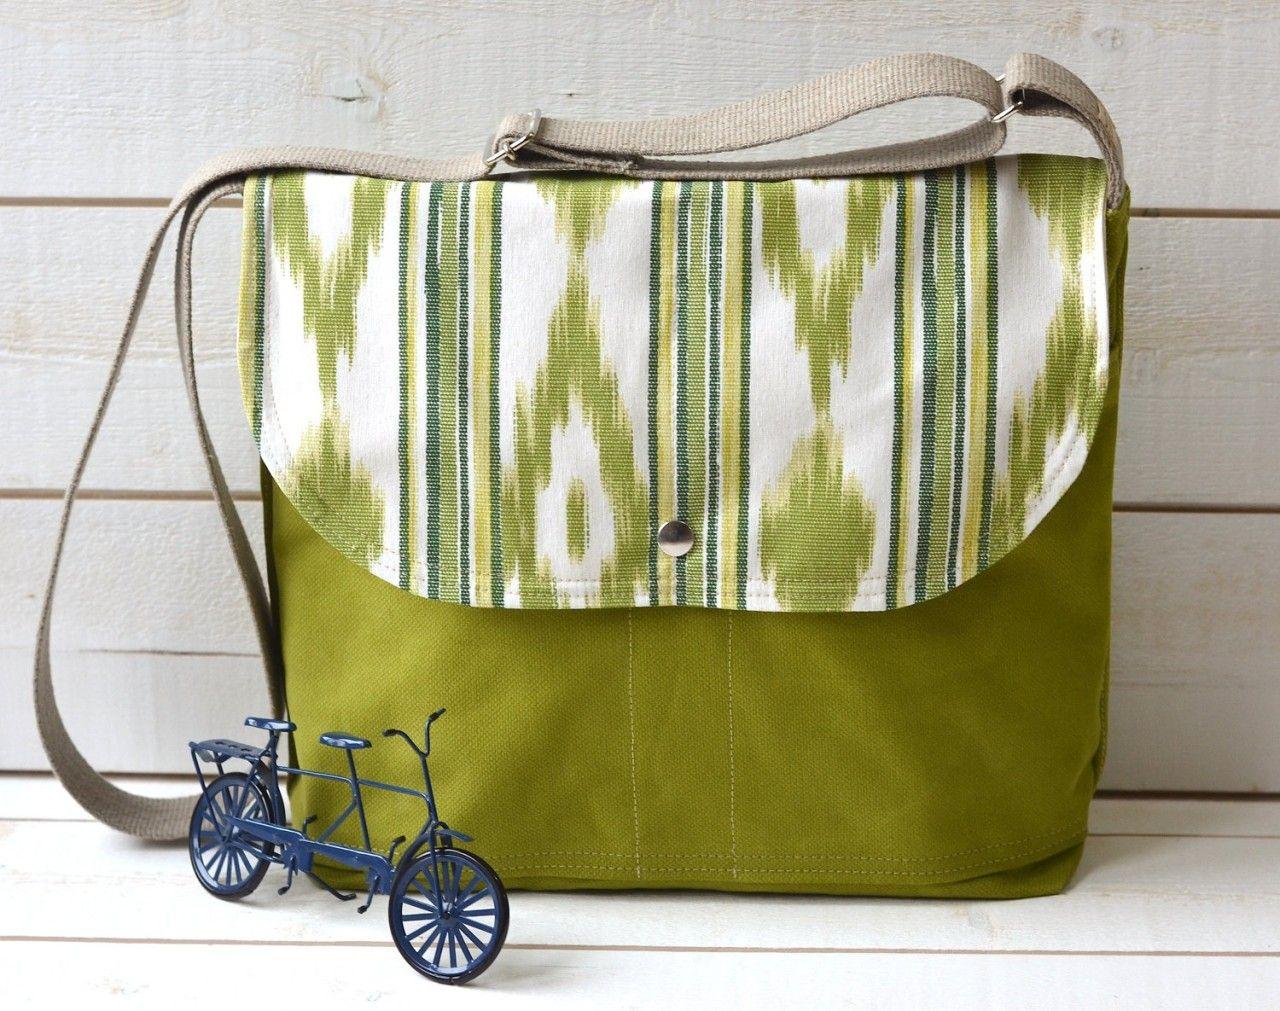 UNISEX Medium IKAT IPAD Messenger bag / Cross body bag in apple green - IKABAGS